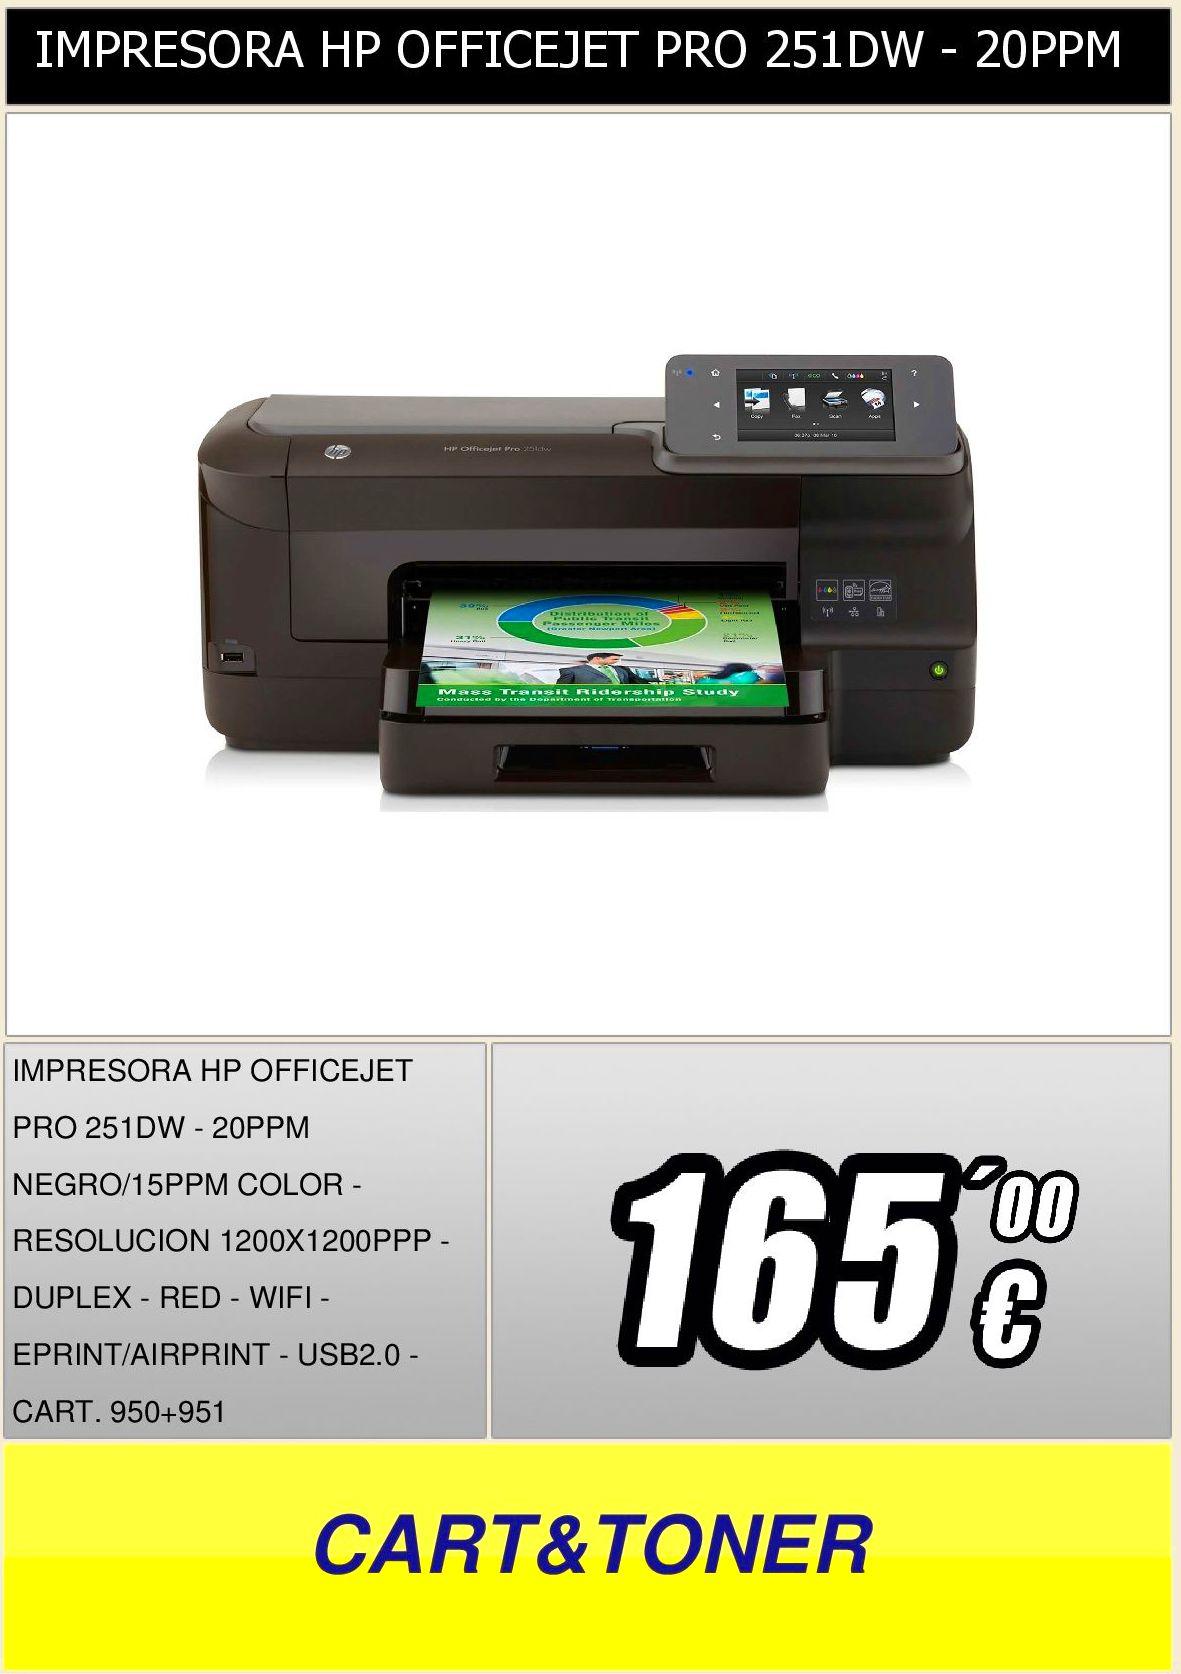 IMPRESORA HP OFFICEJET PRO 251DW - 20PPM NEGRO/15PPM COLOR ...